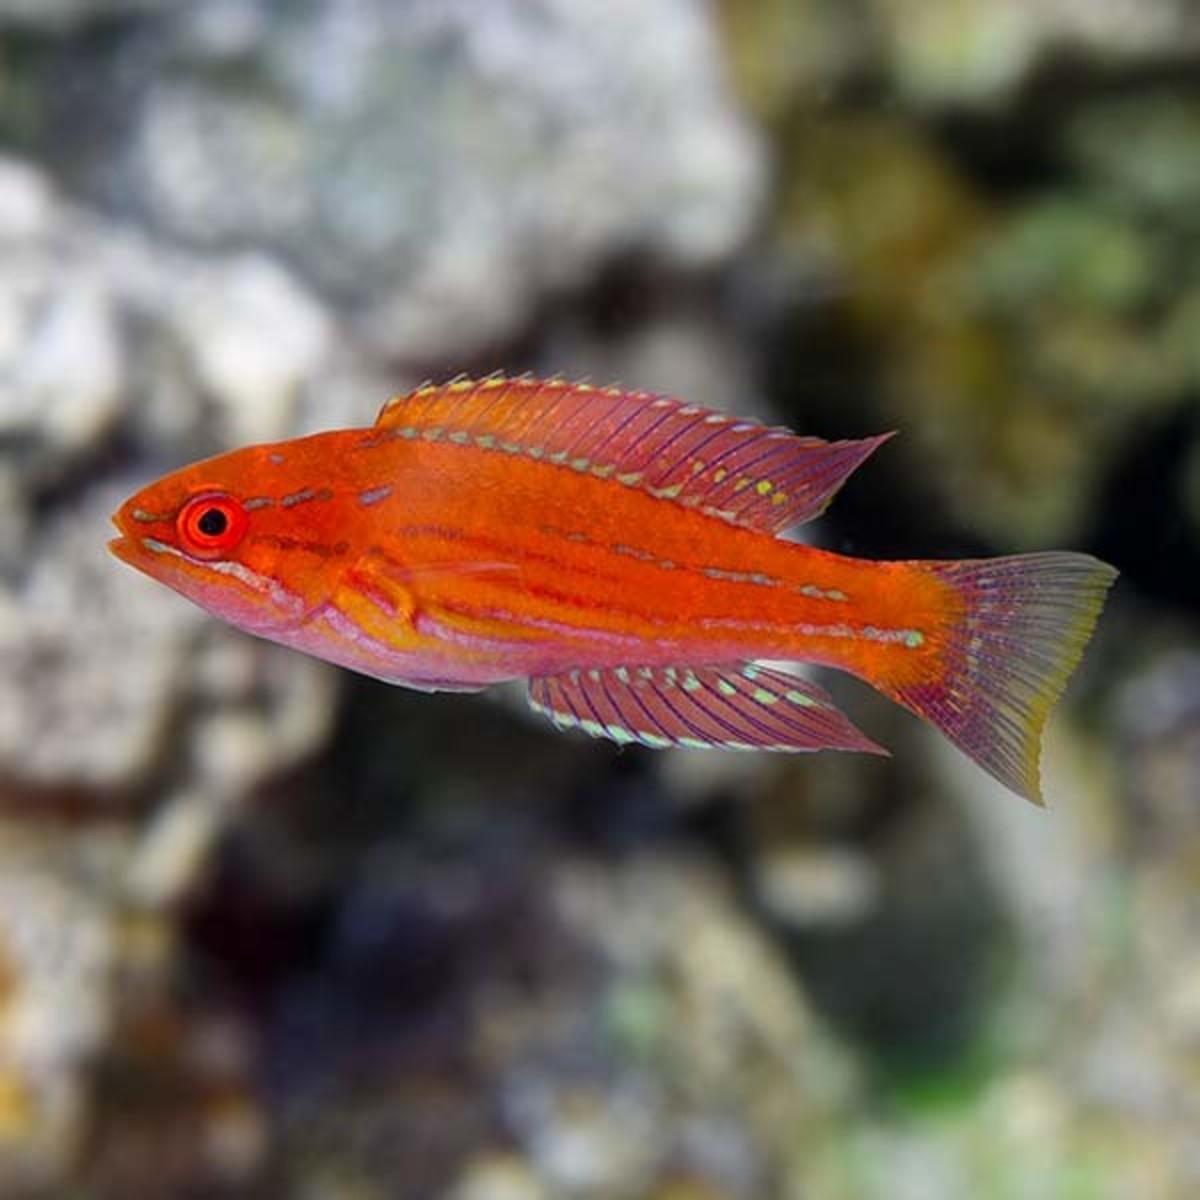 home-aquarium-how-to-care-for-carpenters-flasher-wrasse